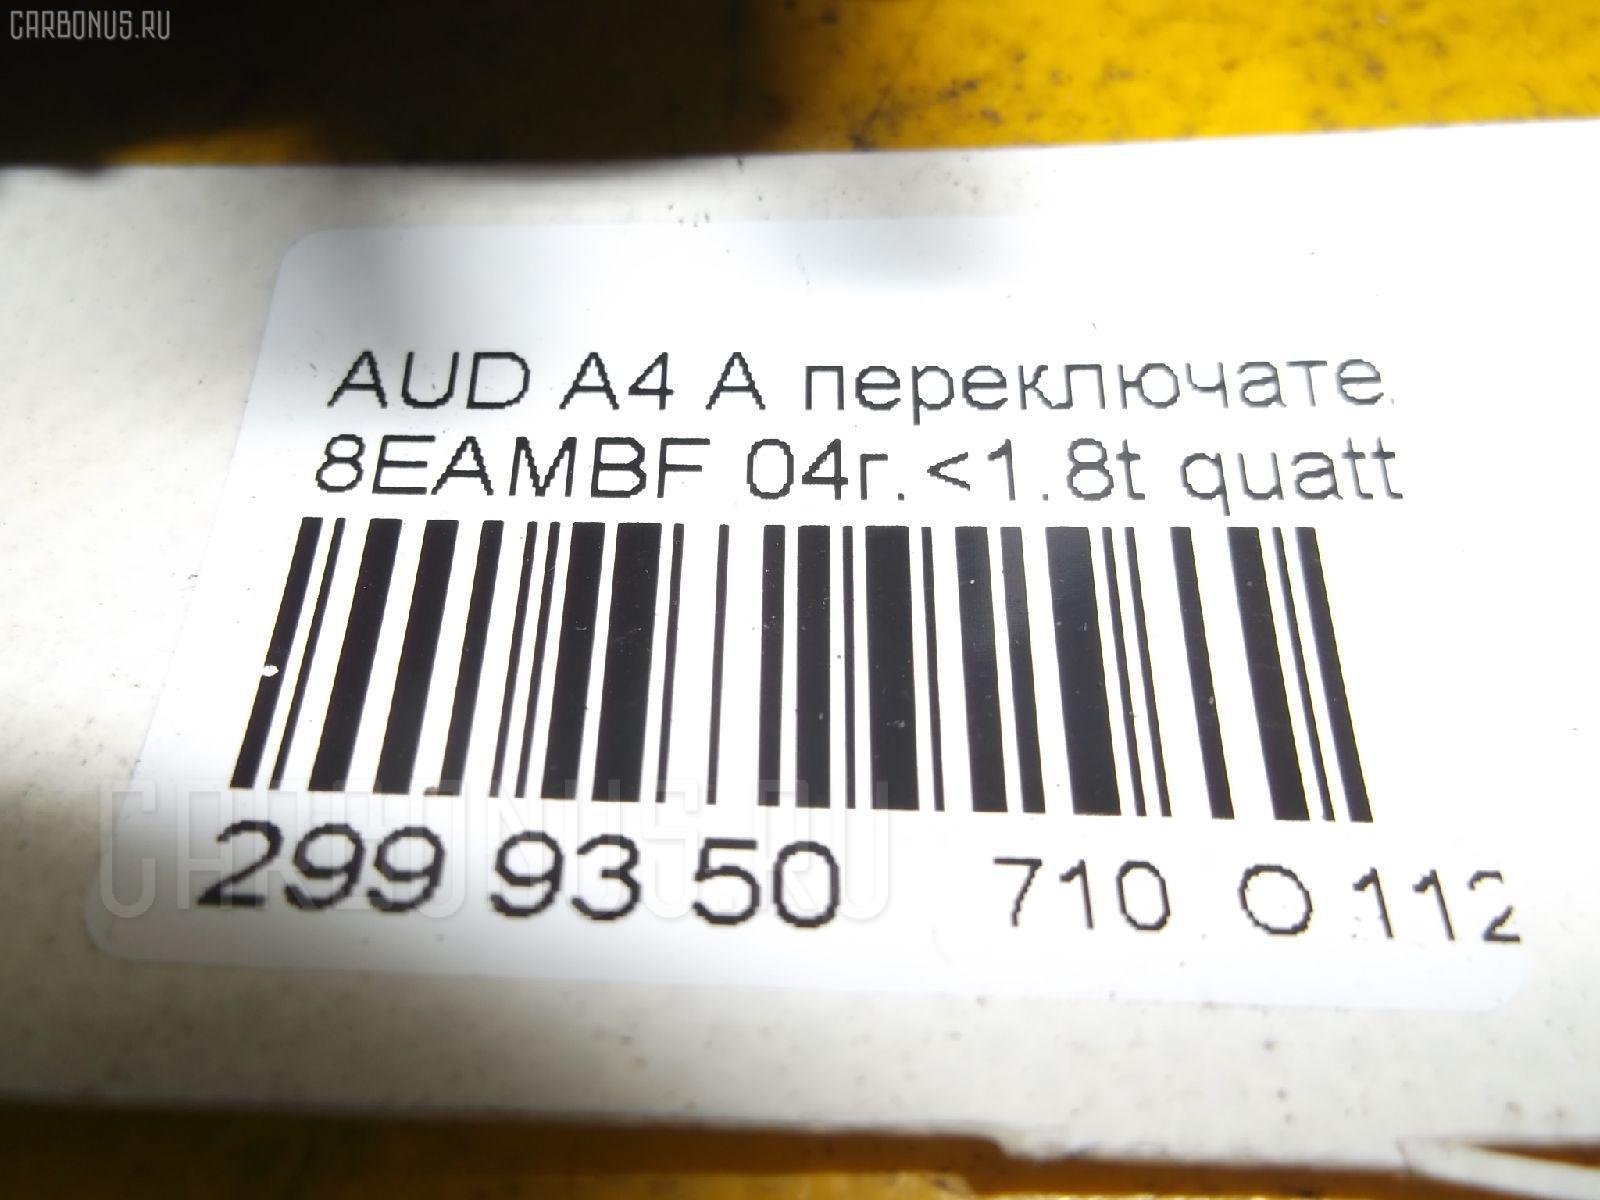 Переключатель поворотов AUDI A4 AVANT 8EAMBF Фото 9